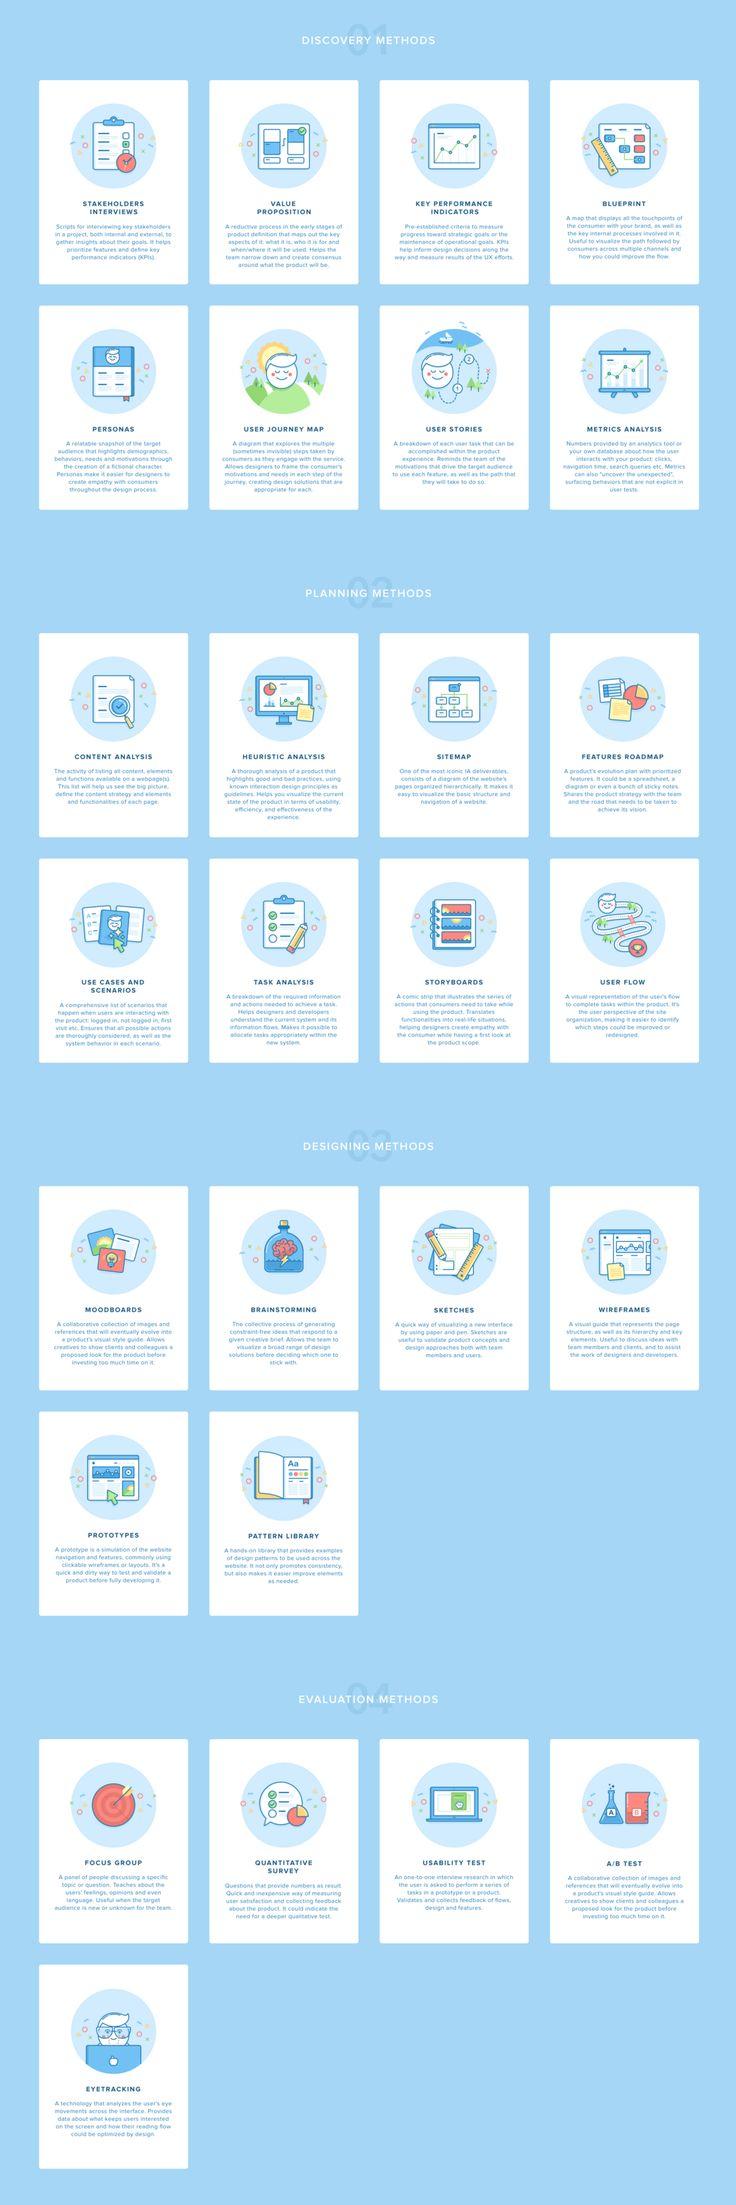 引导页UI设计UX methods an...@daodaooO采集到Boot Page(48图)_花瓣